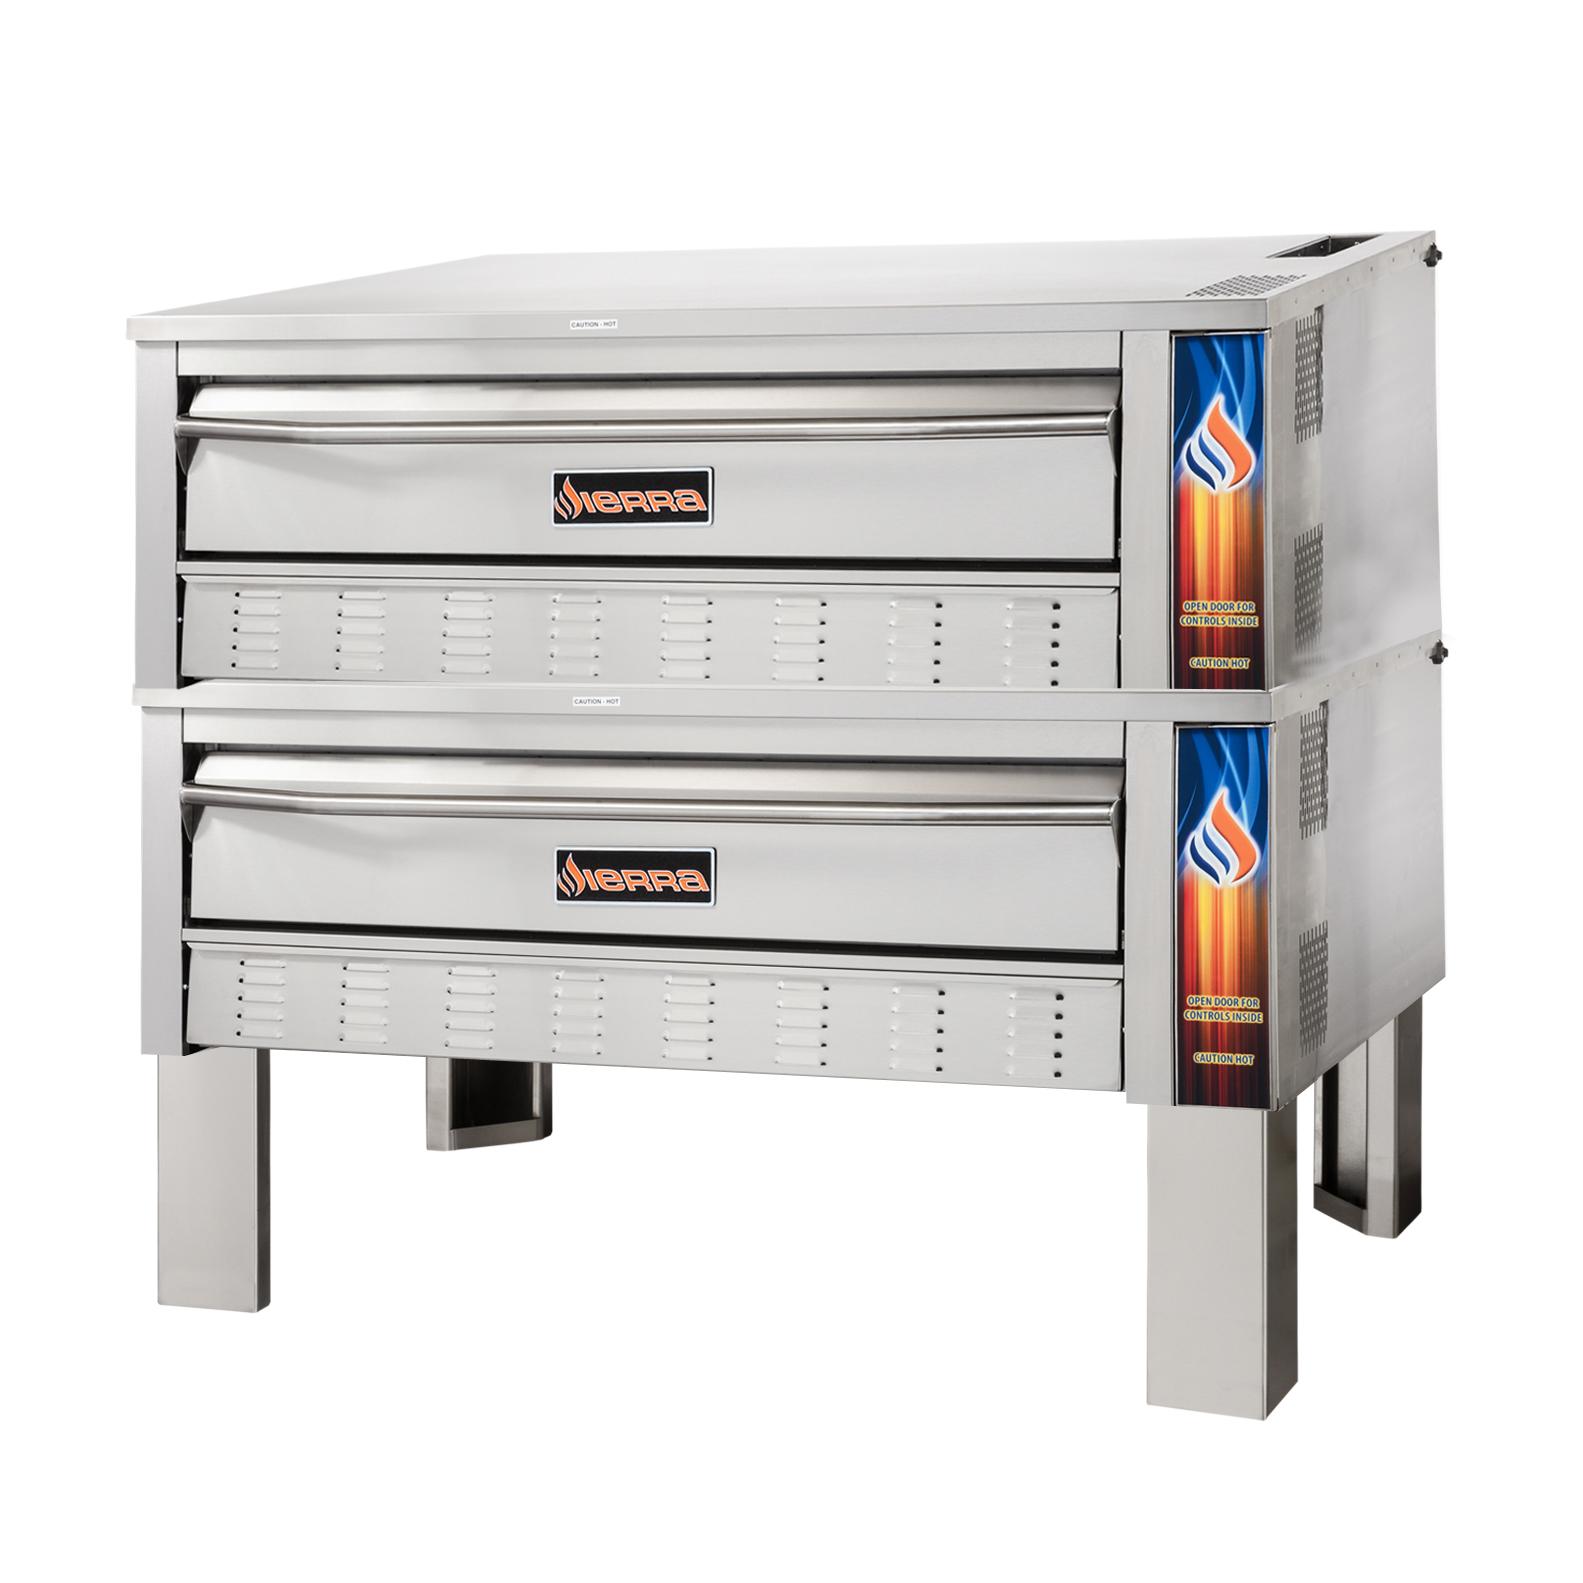 MVP SRPO-60G-2 pizza bake oven, deck-type, gas